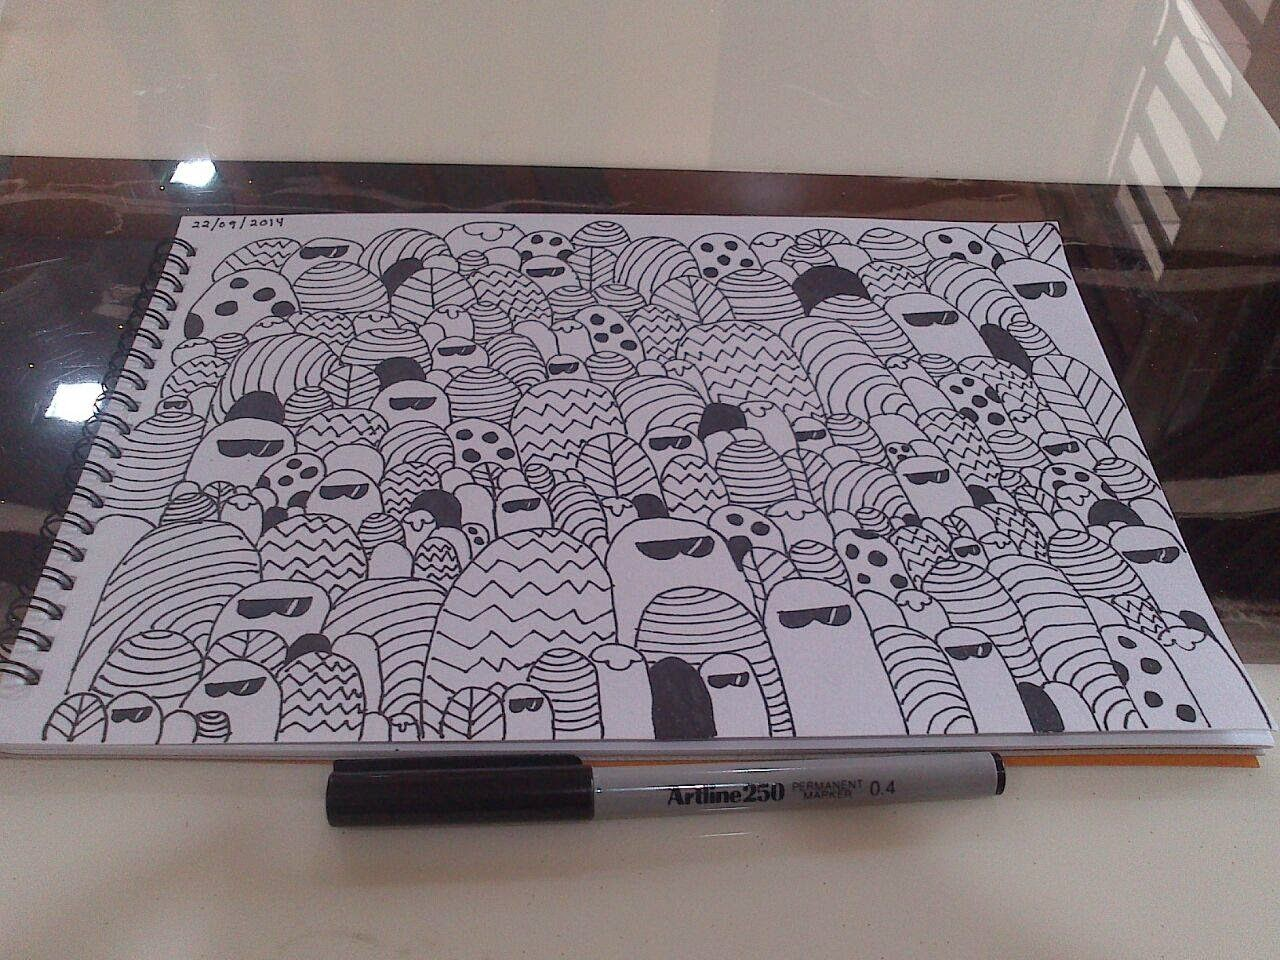 belajar buat doodle